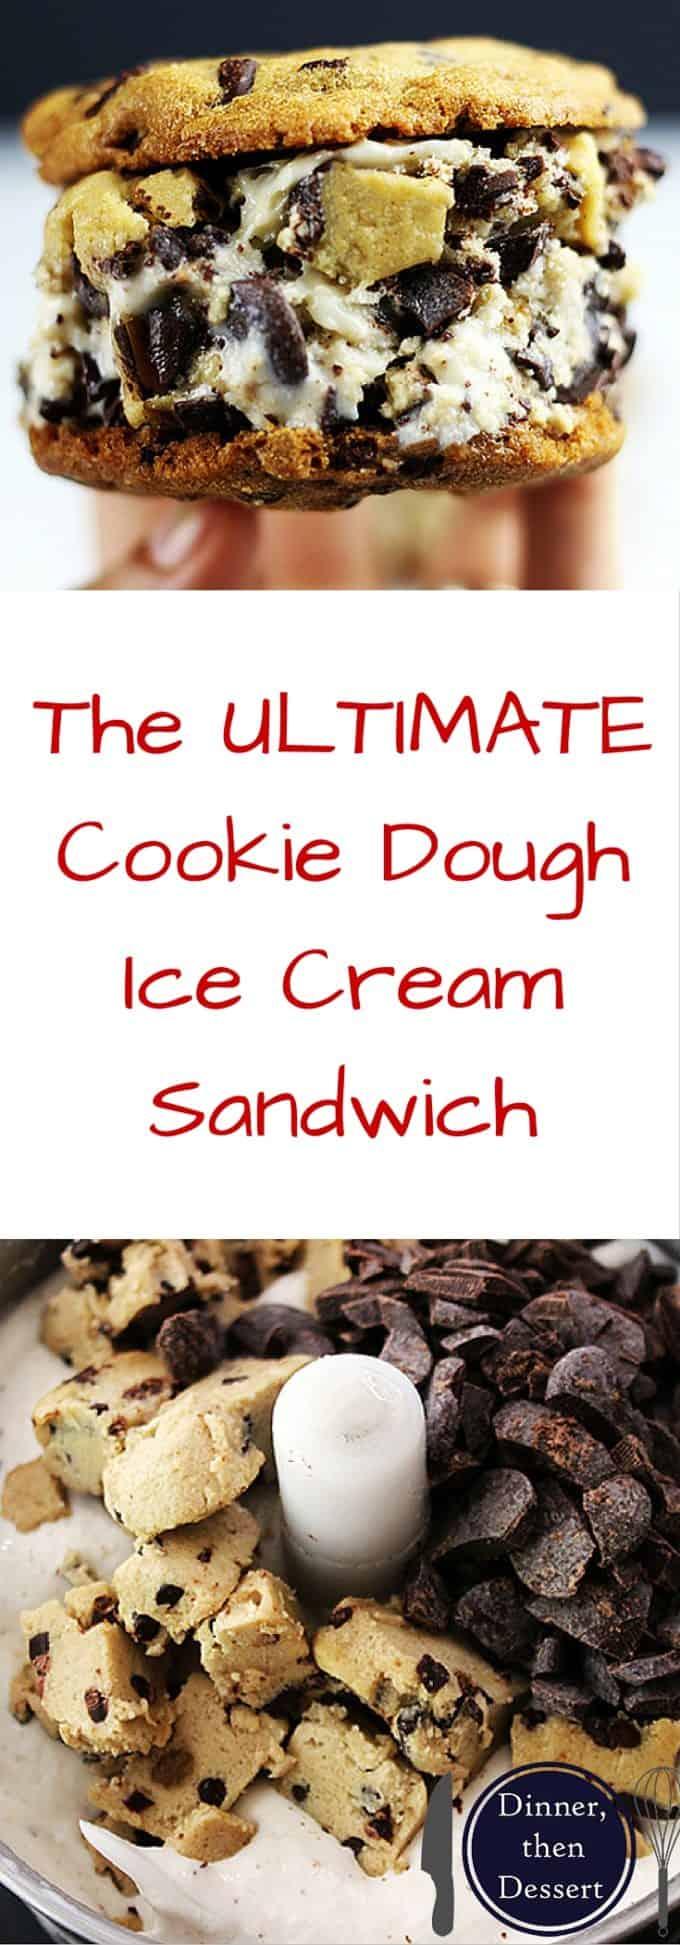 The Ultimate Cookie Dough Ice Cream Sandwich - Dinner, then Dessert